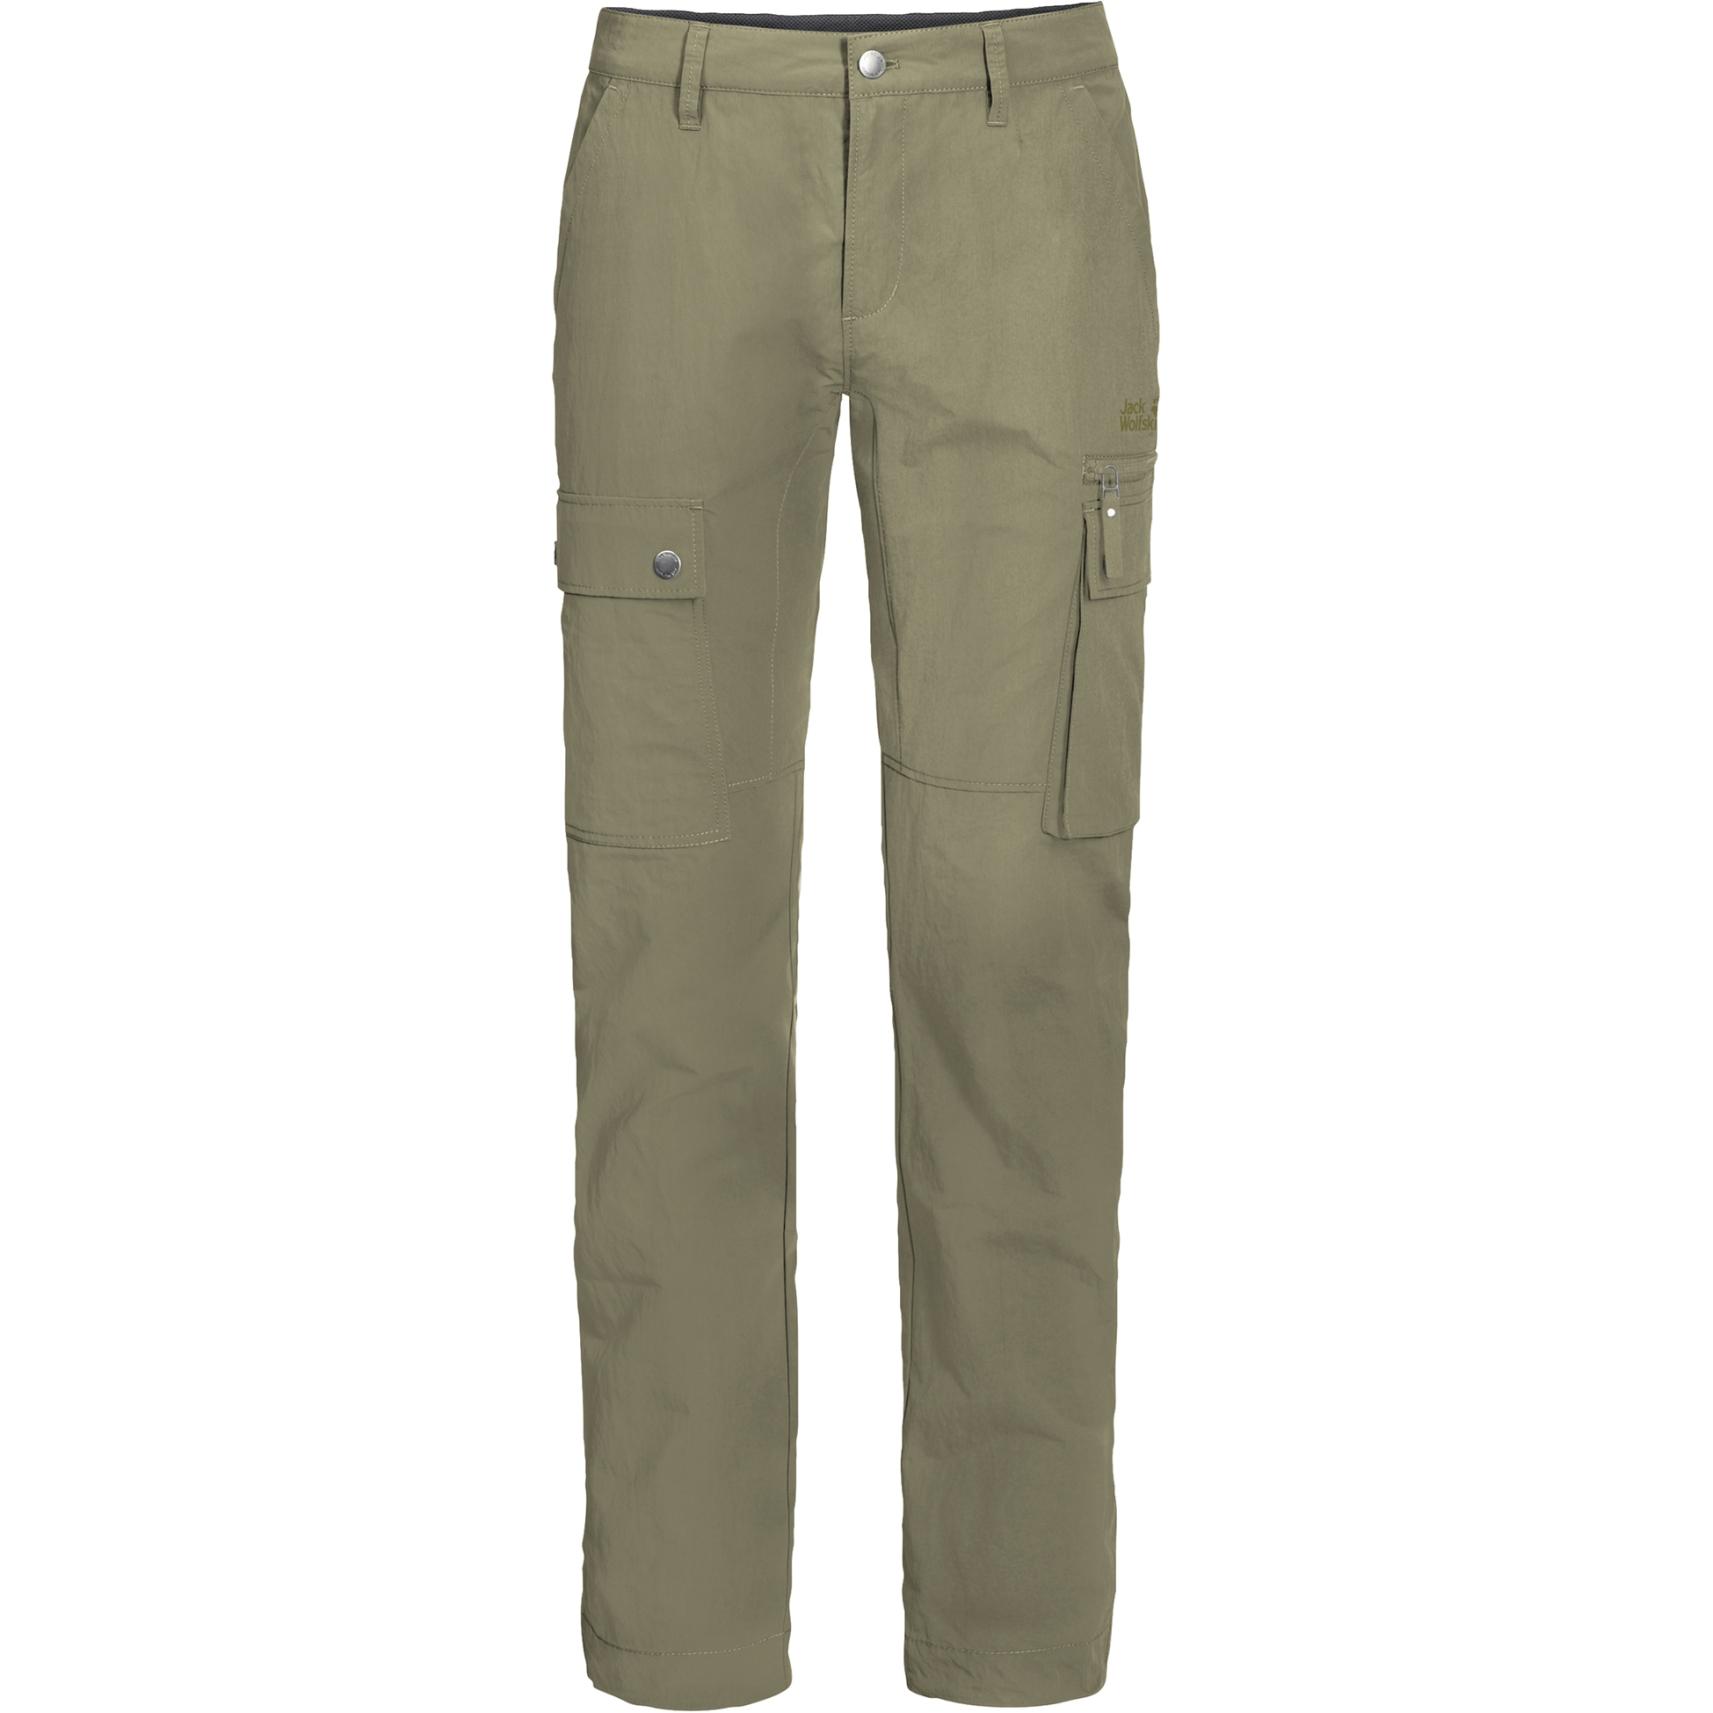 Jack Wolfskin Lakeside Pants M - khaki